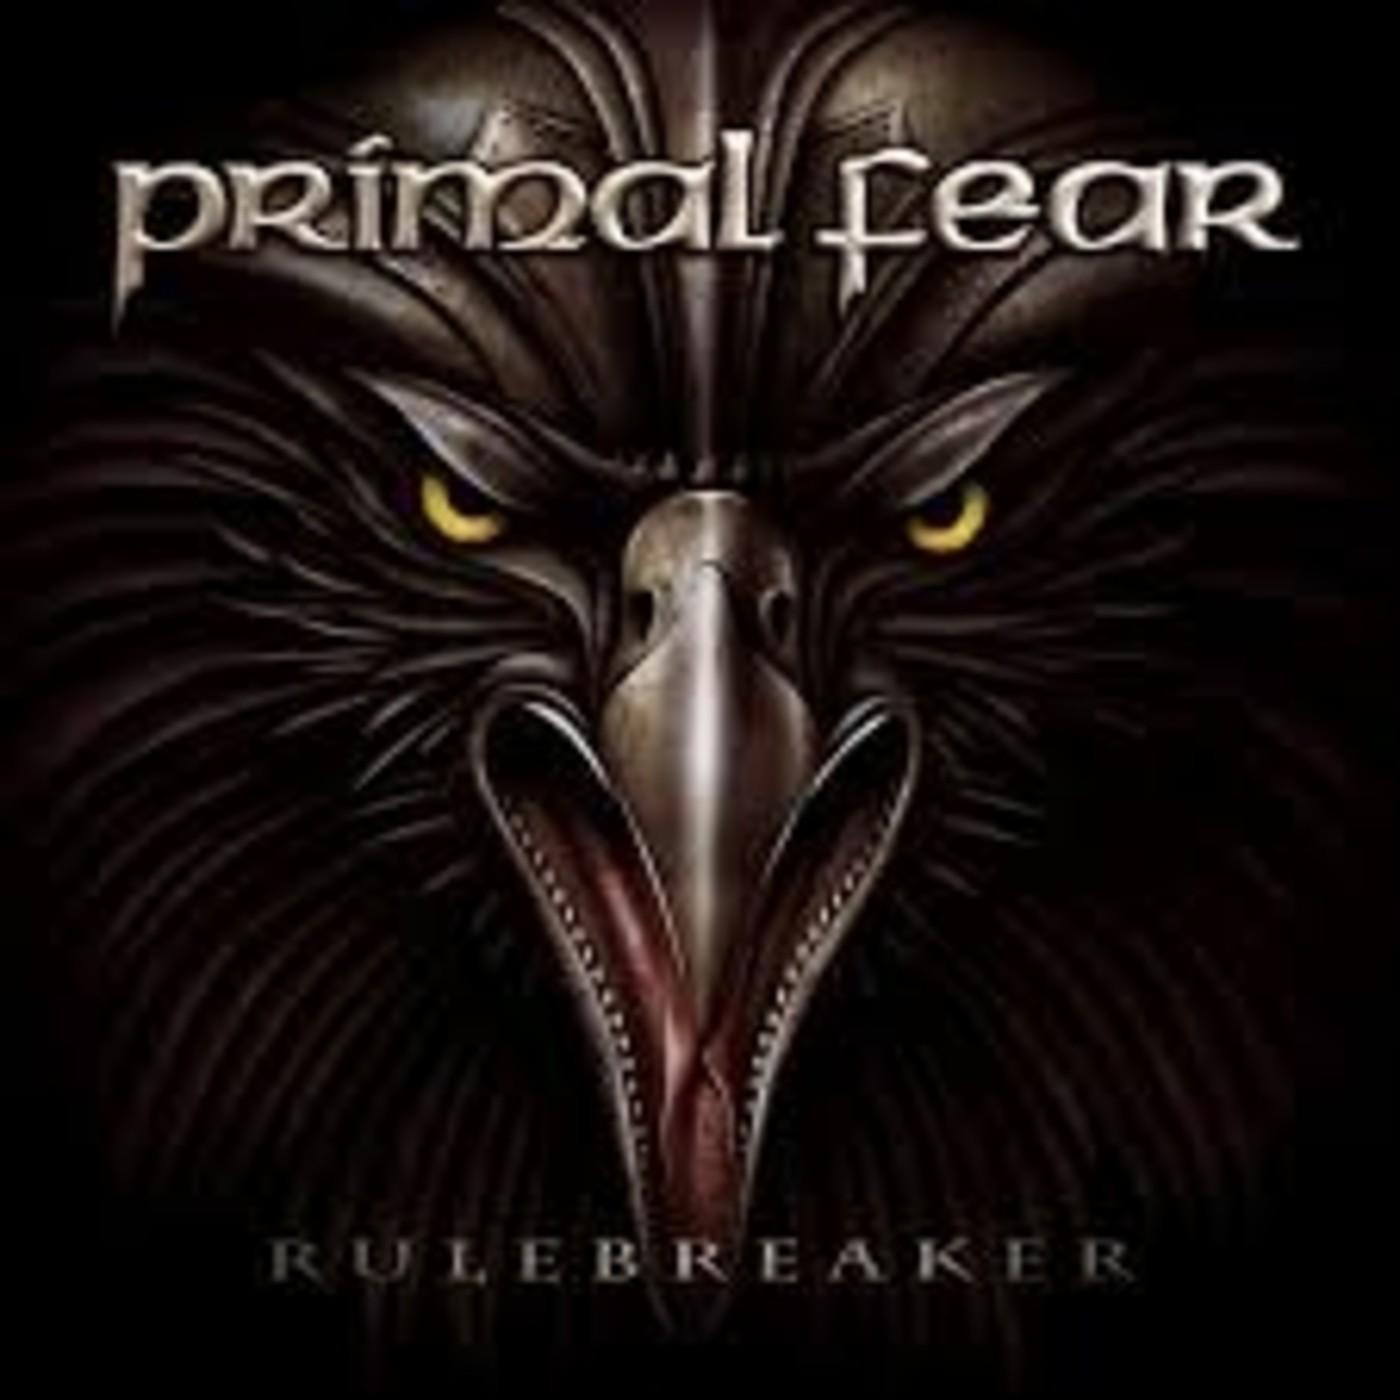 mp3 primal fear